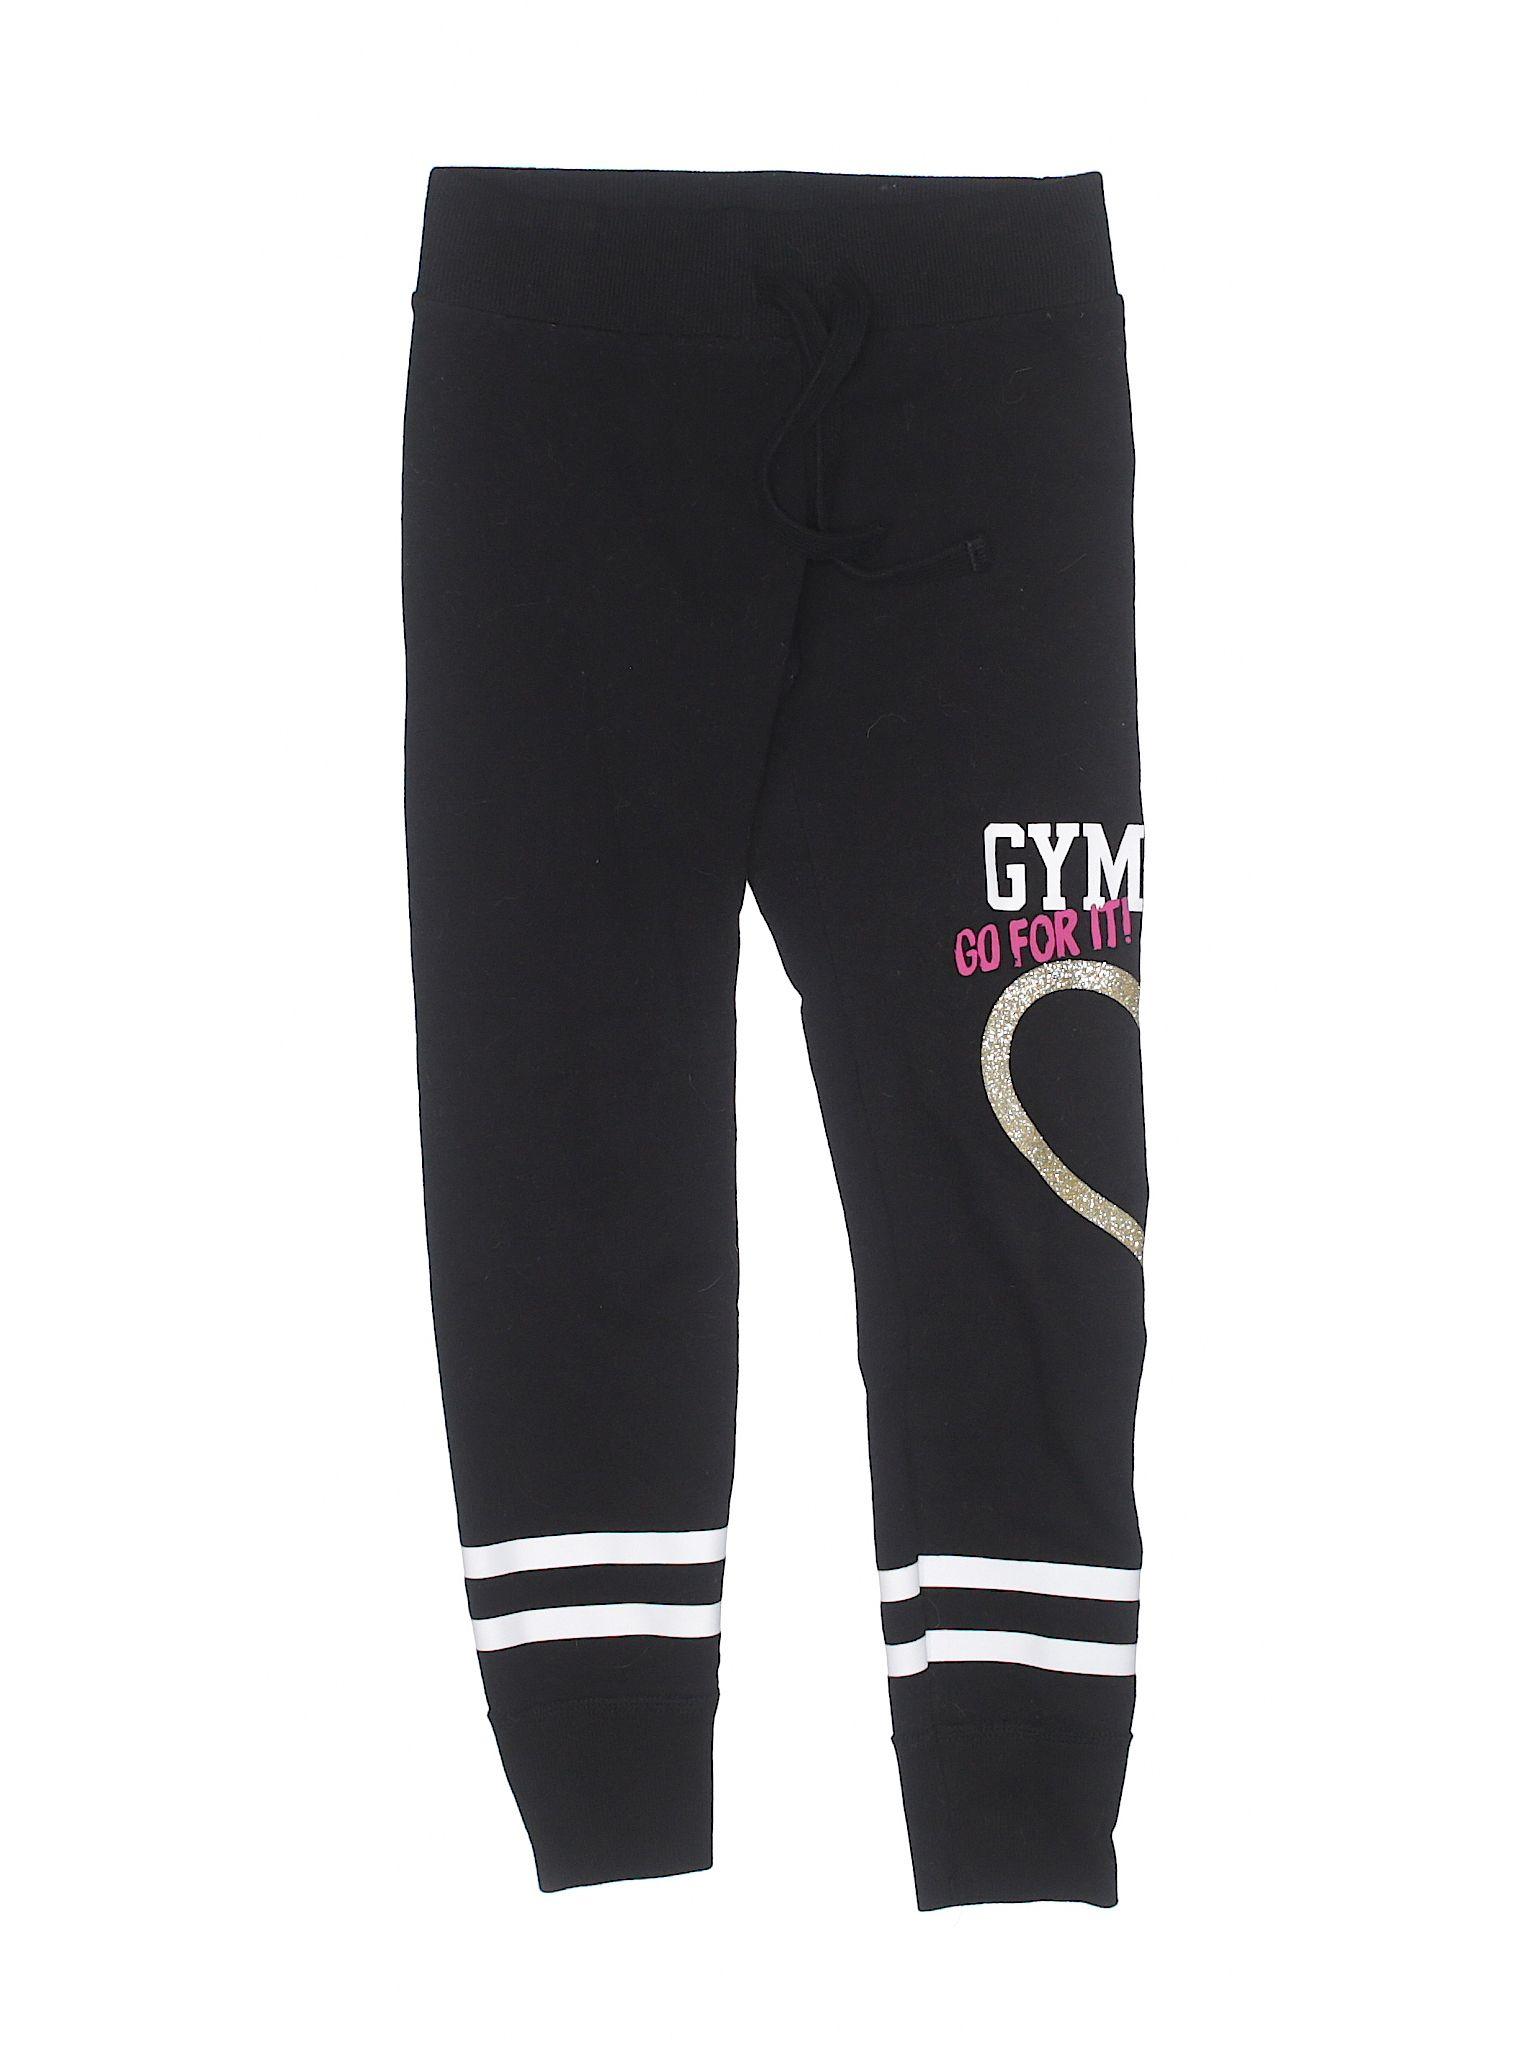 Sweatpants Sweatpants, Black girls, Sport girl